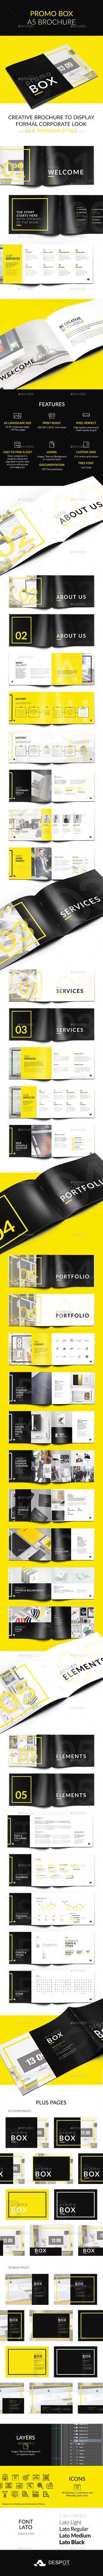 Promo BOX A5 Brochure Template PSD. Download here: https://graphicriver.net/item/promo-box-a5-brochure/16936313?ref=ksioks